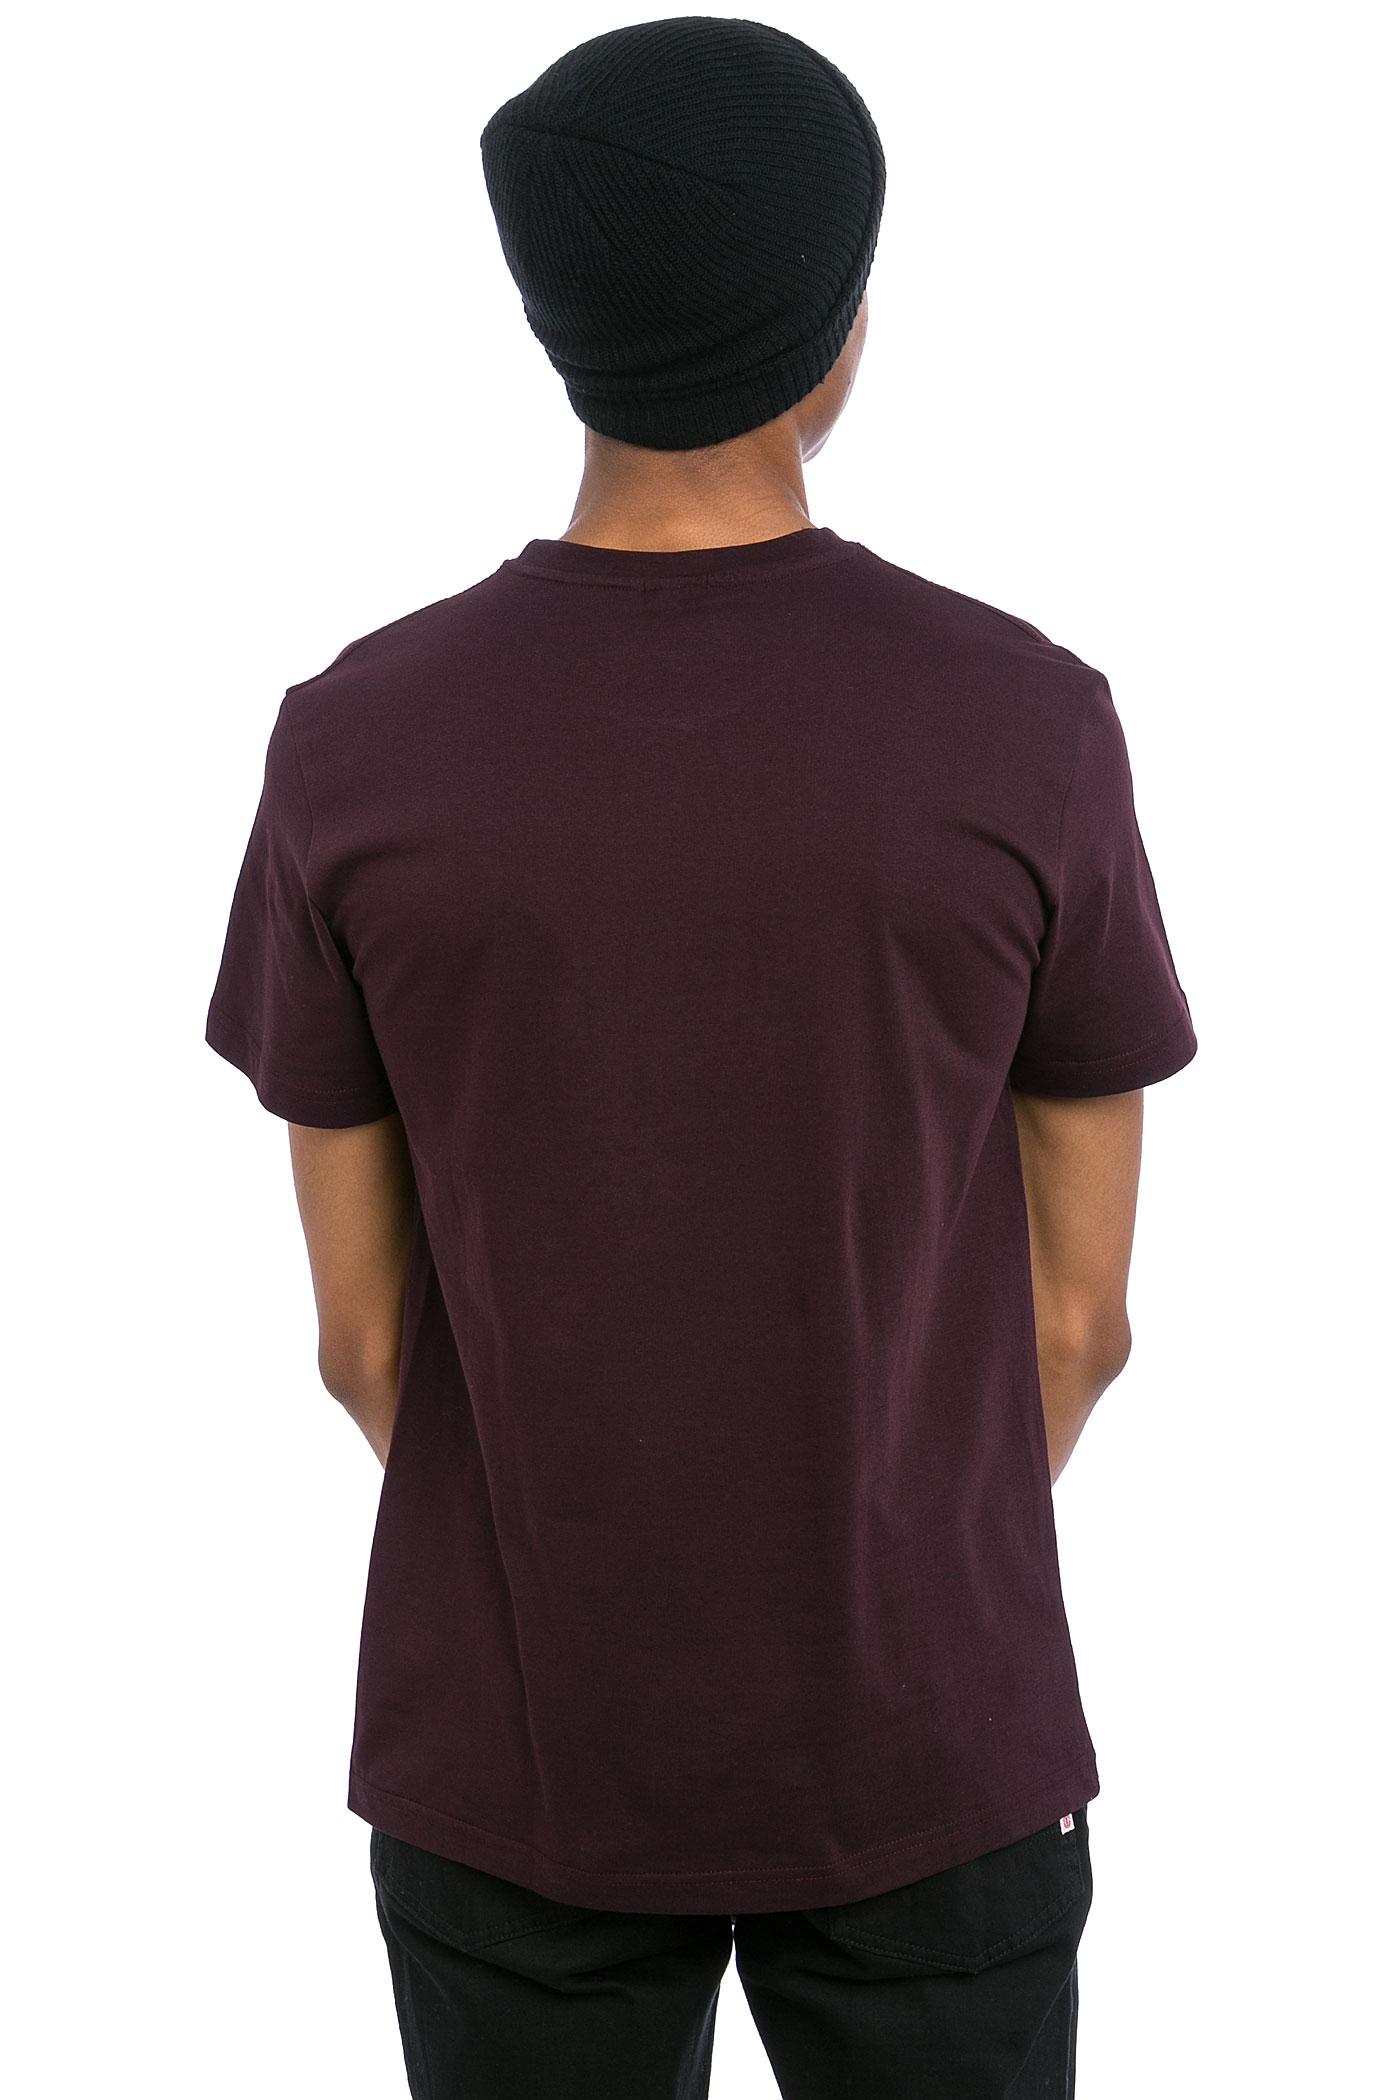 iriedaily cobblestone t shirt aubergine buy at skatedeluxe. Black Bedroom Furniture Sets. Home Design Ideas